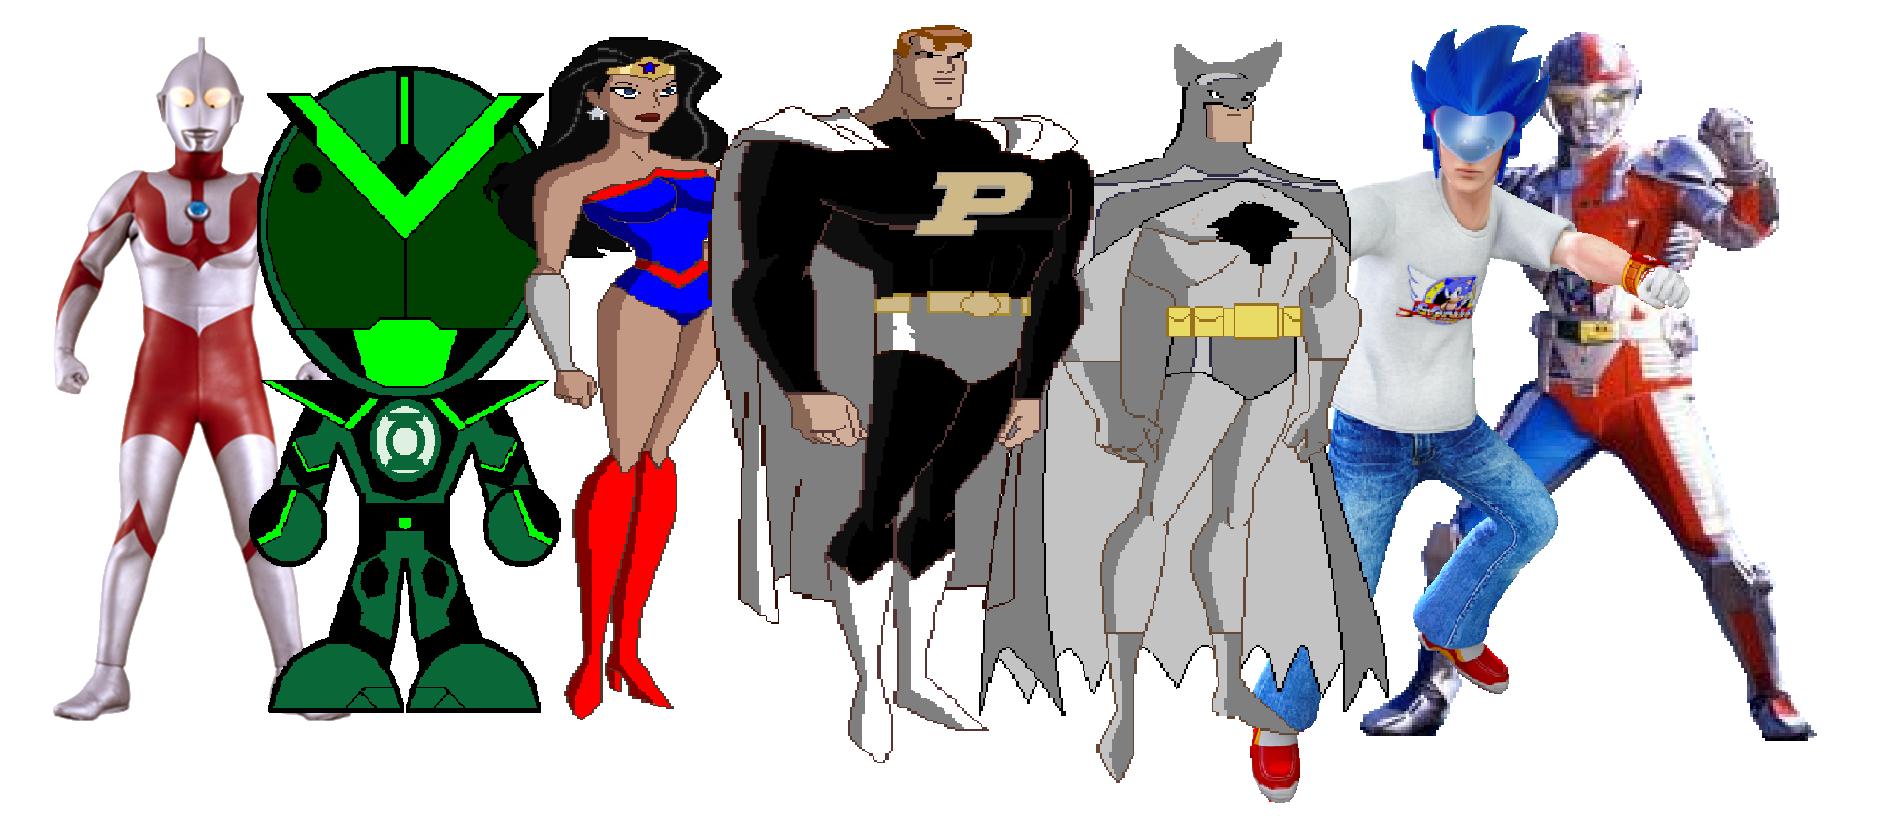 Hero League